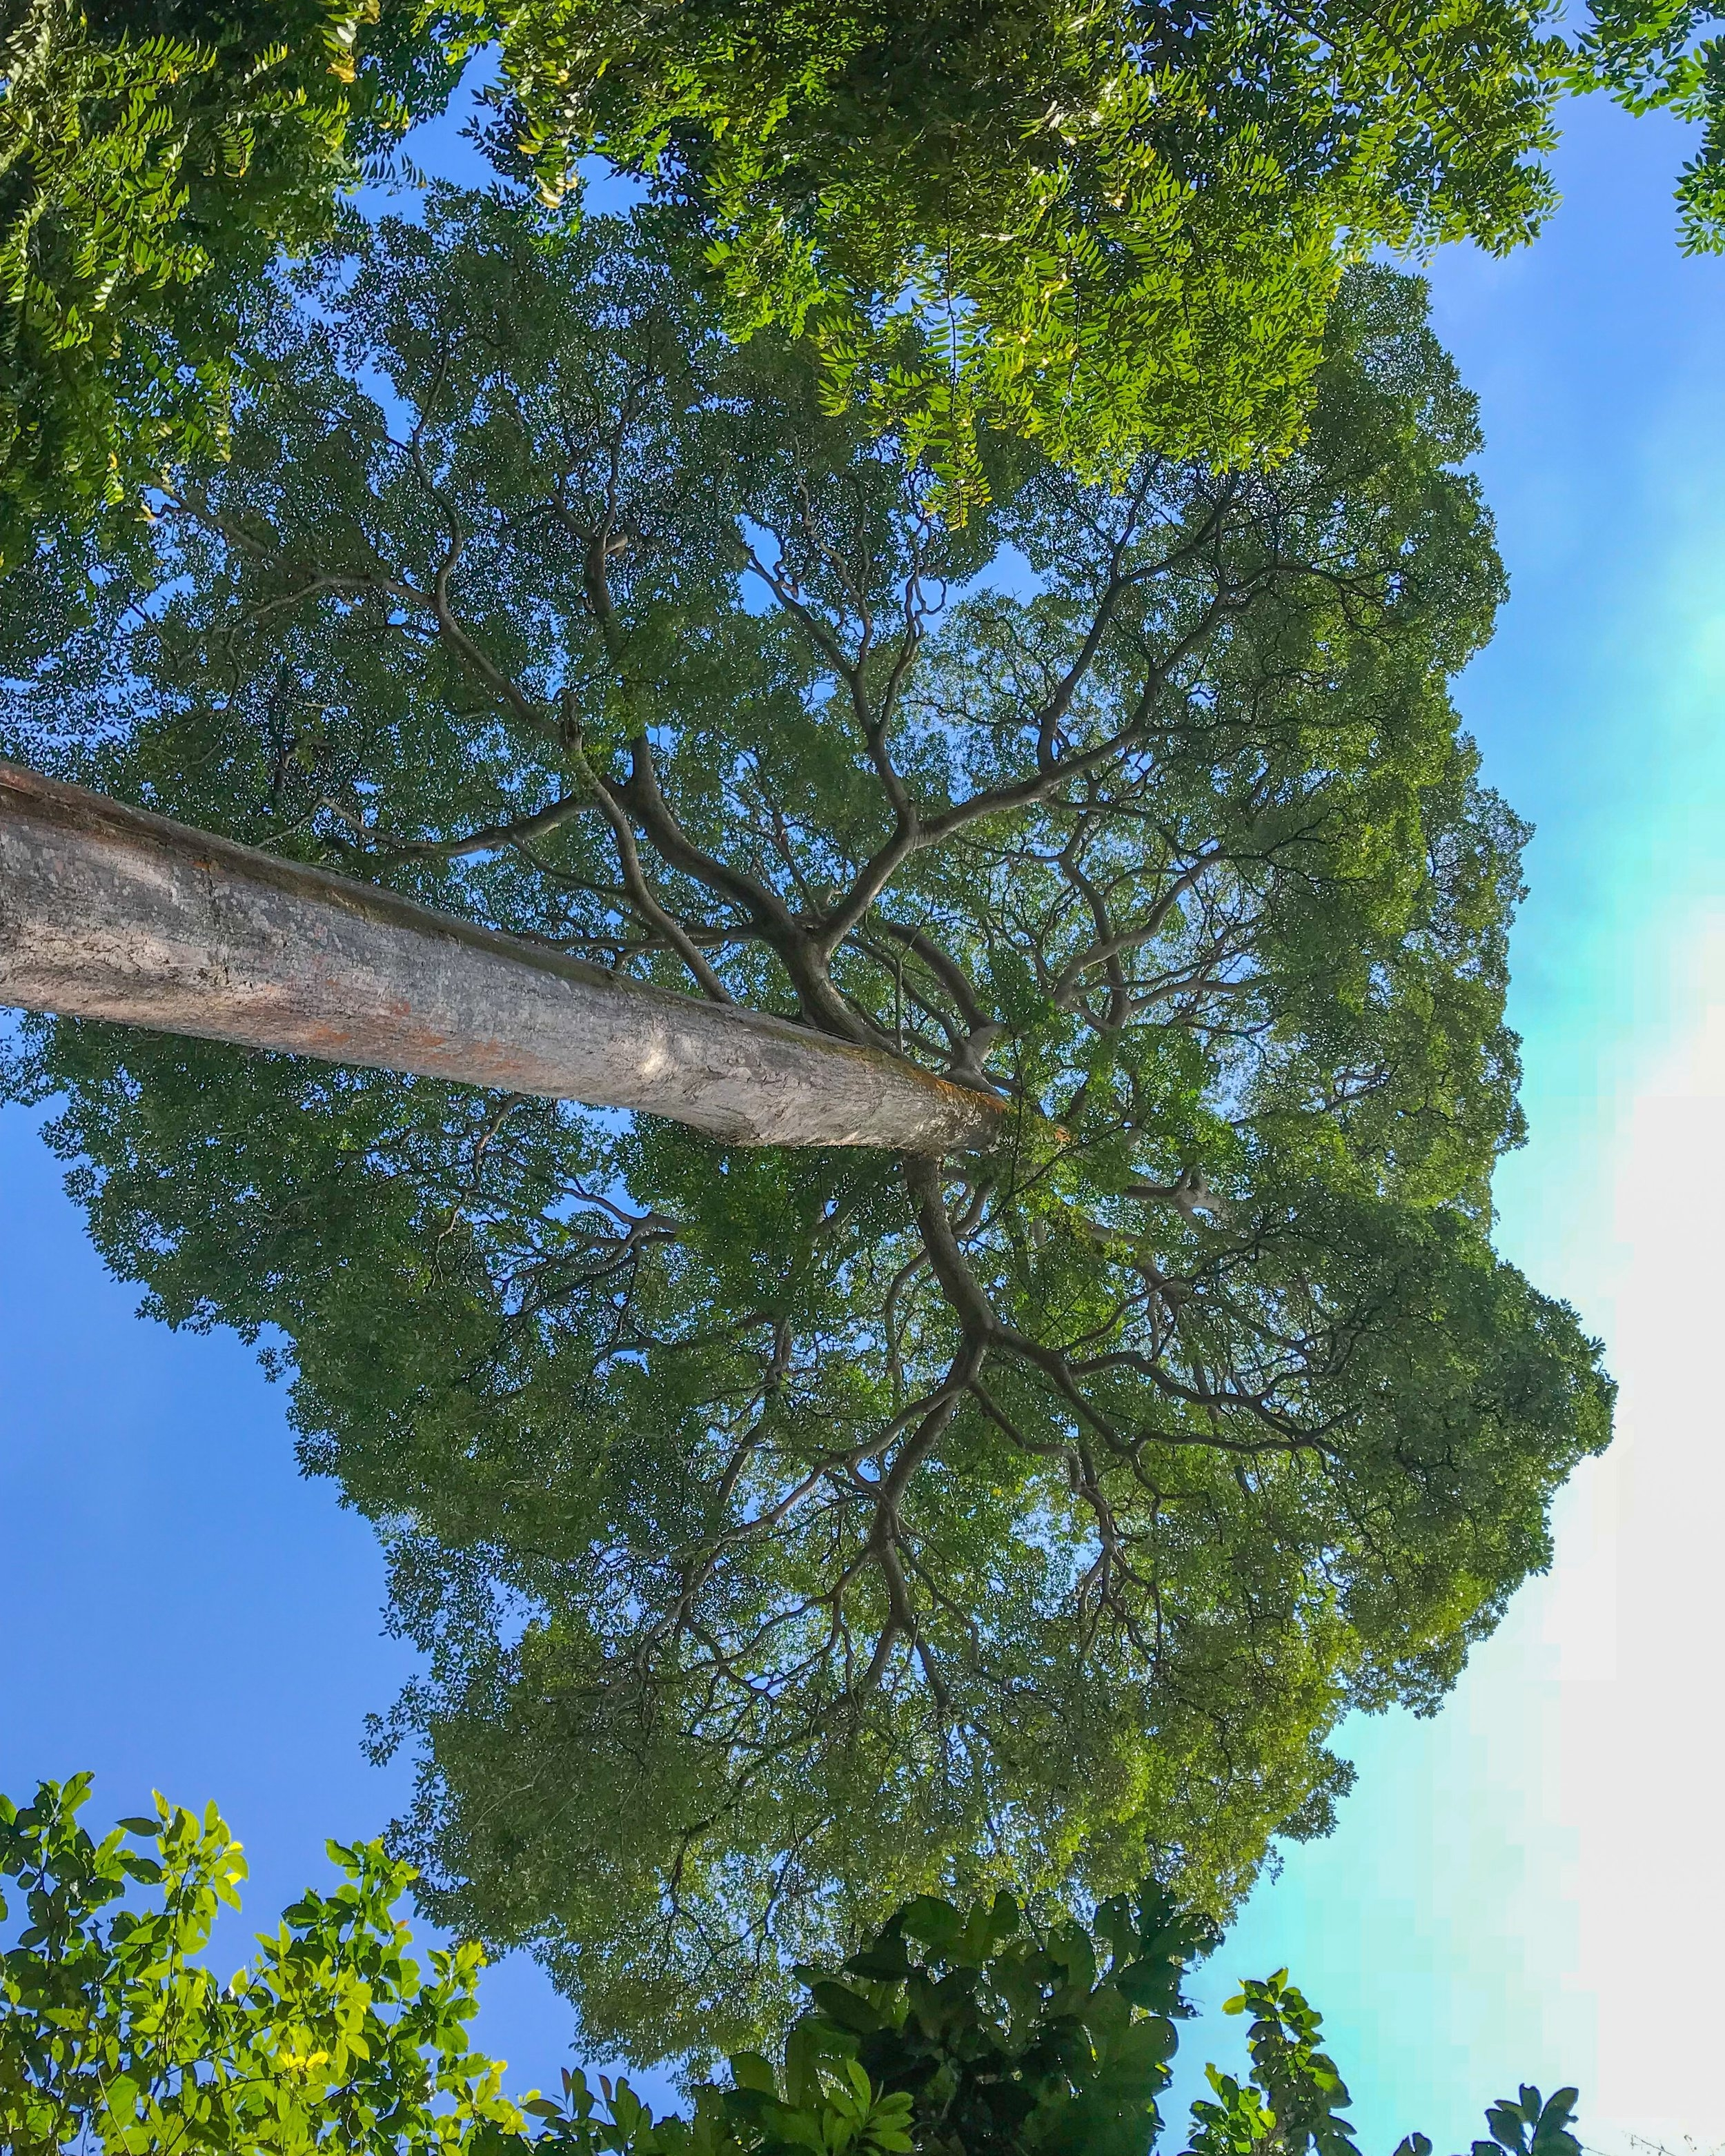 My favorite tree in Pulau Ubin